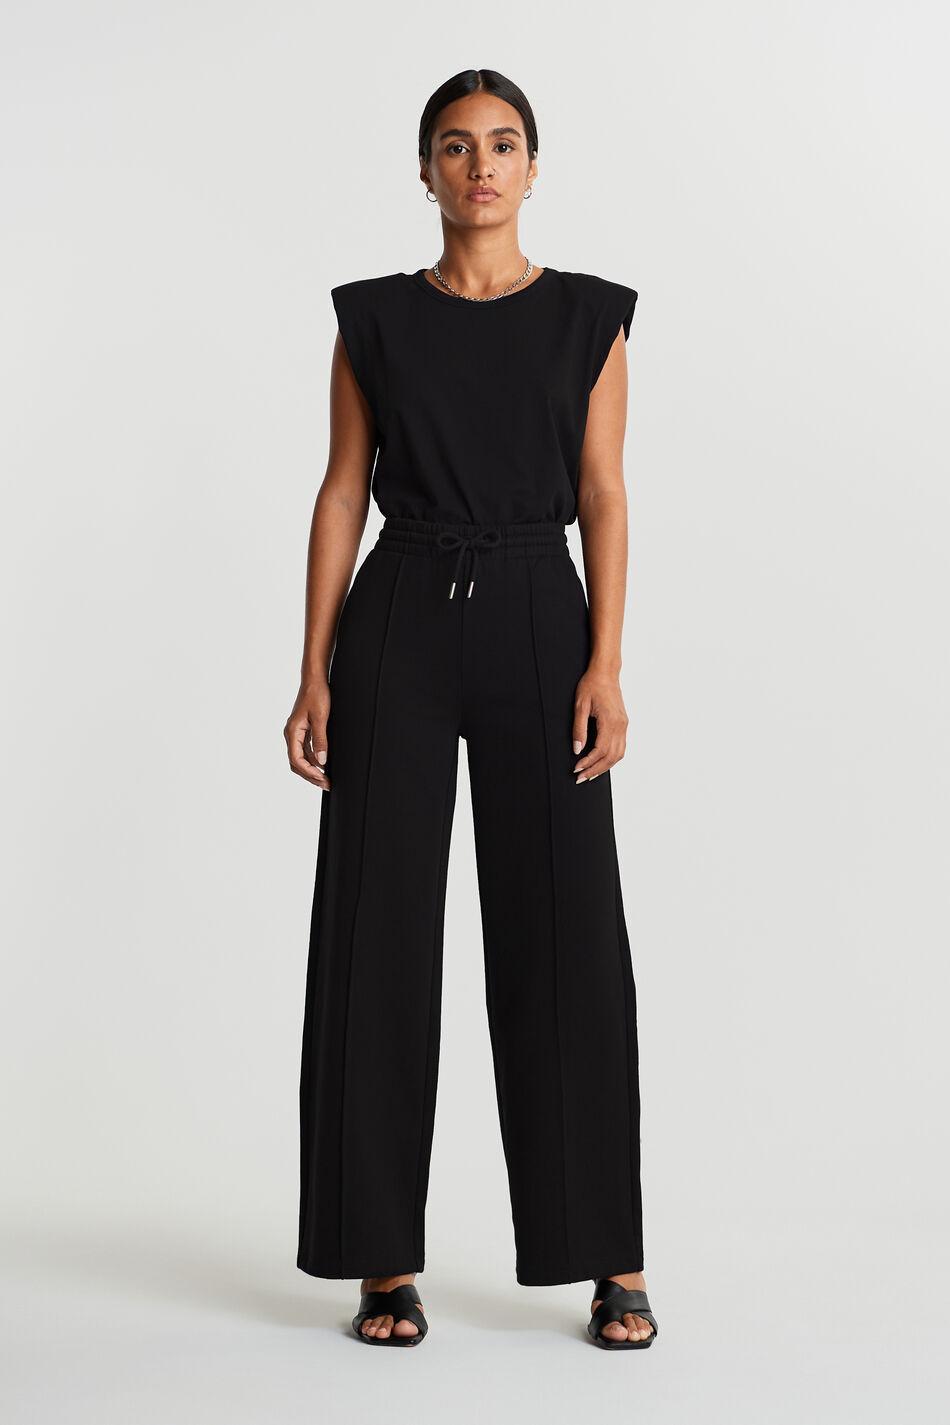 Gina Tricot Bonnie sweatpants L Female Black (9000)